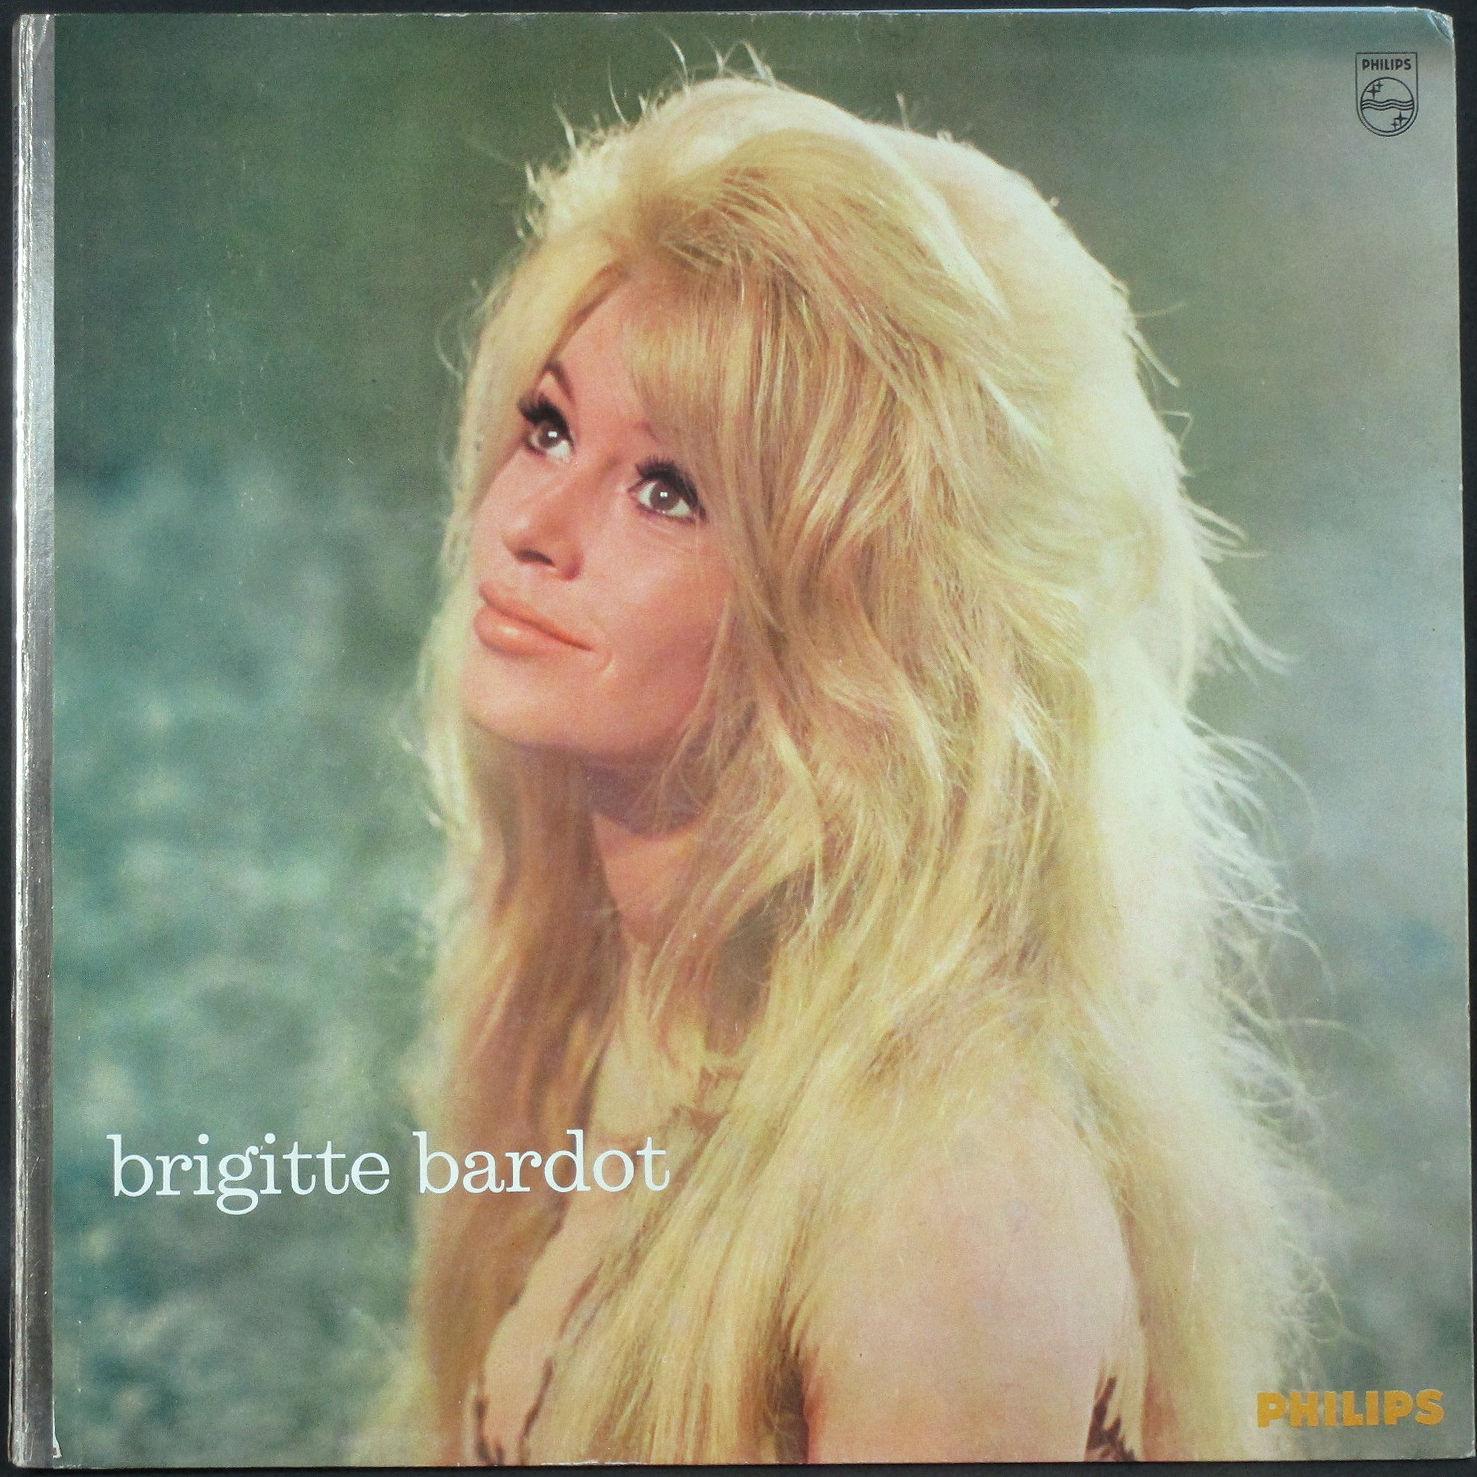 Brigitte Bardot ブリジット・バルドー / Brigitte Bardot